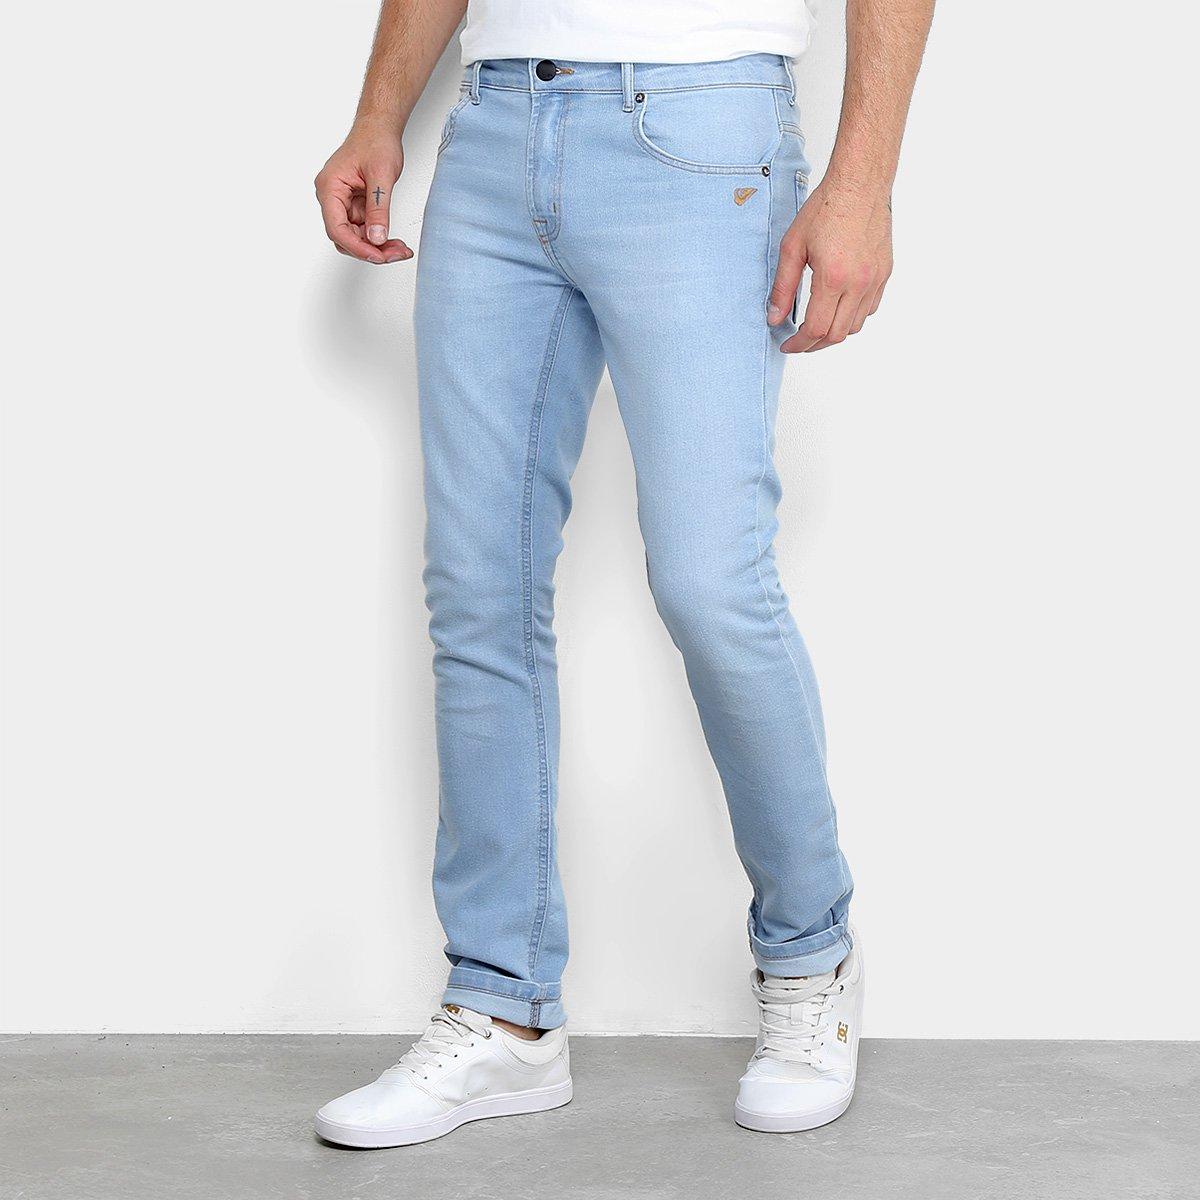 ea4bc6b06eeb1 Calça Jeans Quiksilver Artor Delave Masculina - Compre Agora